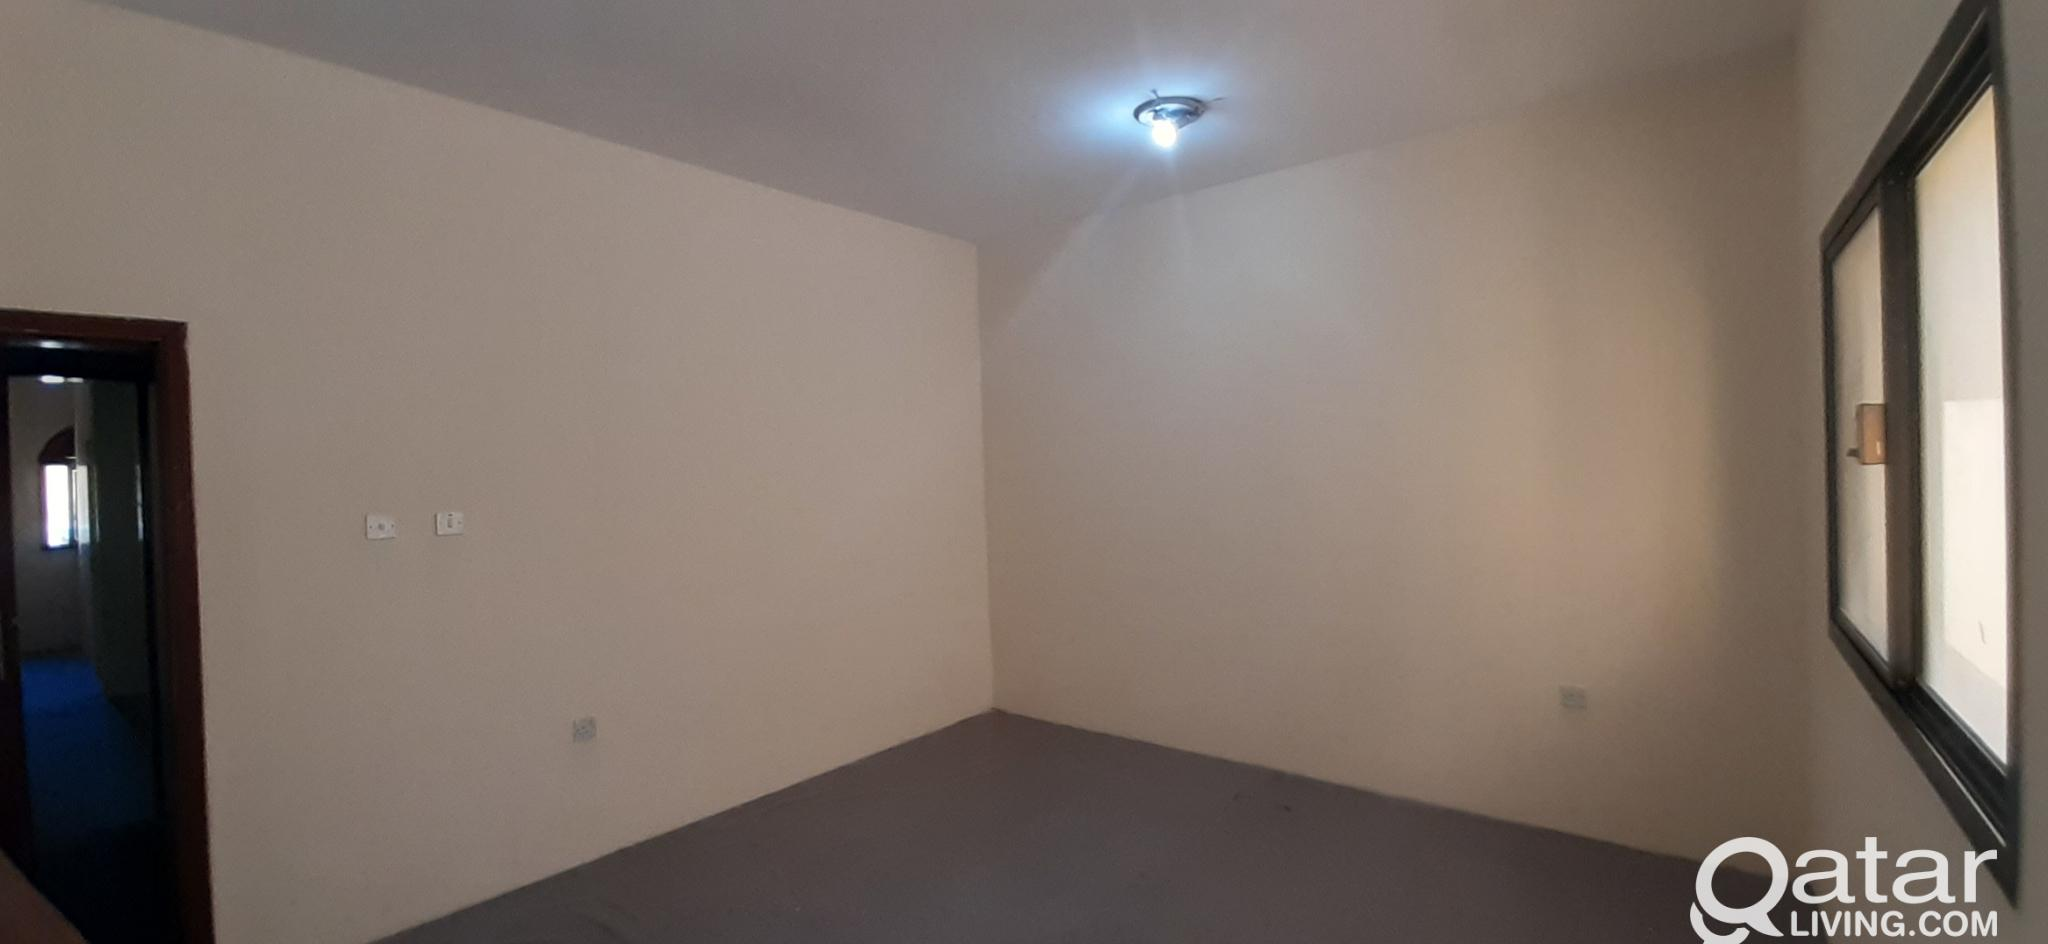 SPACIOUS *2 BEDROOM,*2 BATHROOM,HALL & KITCHEN INC